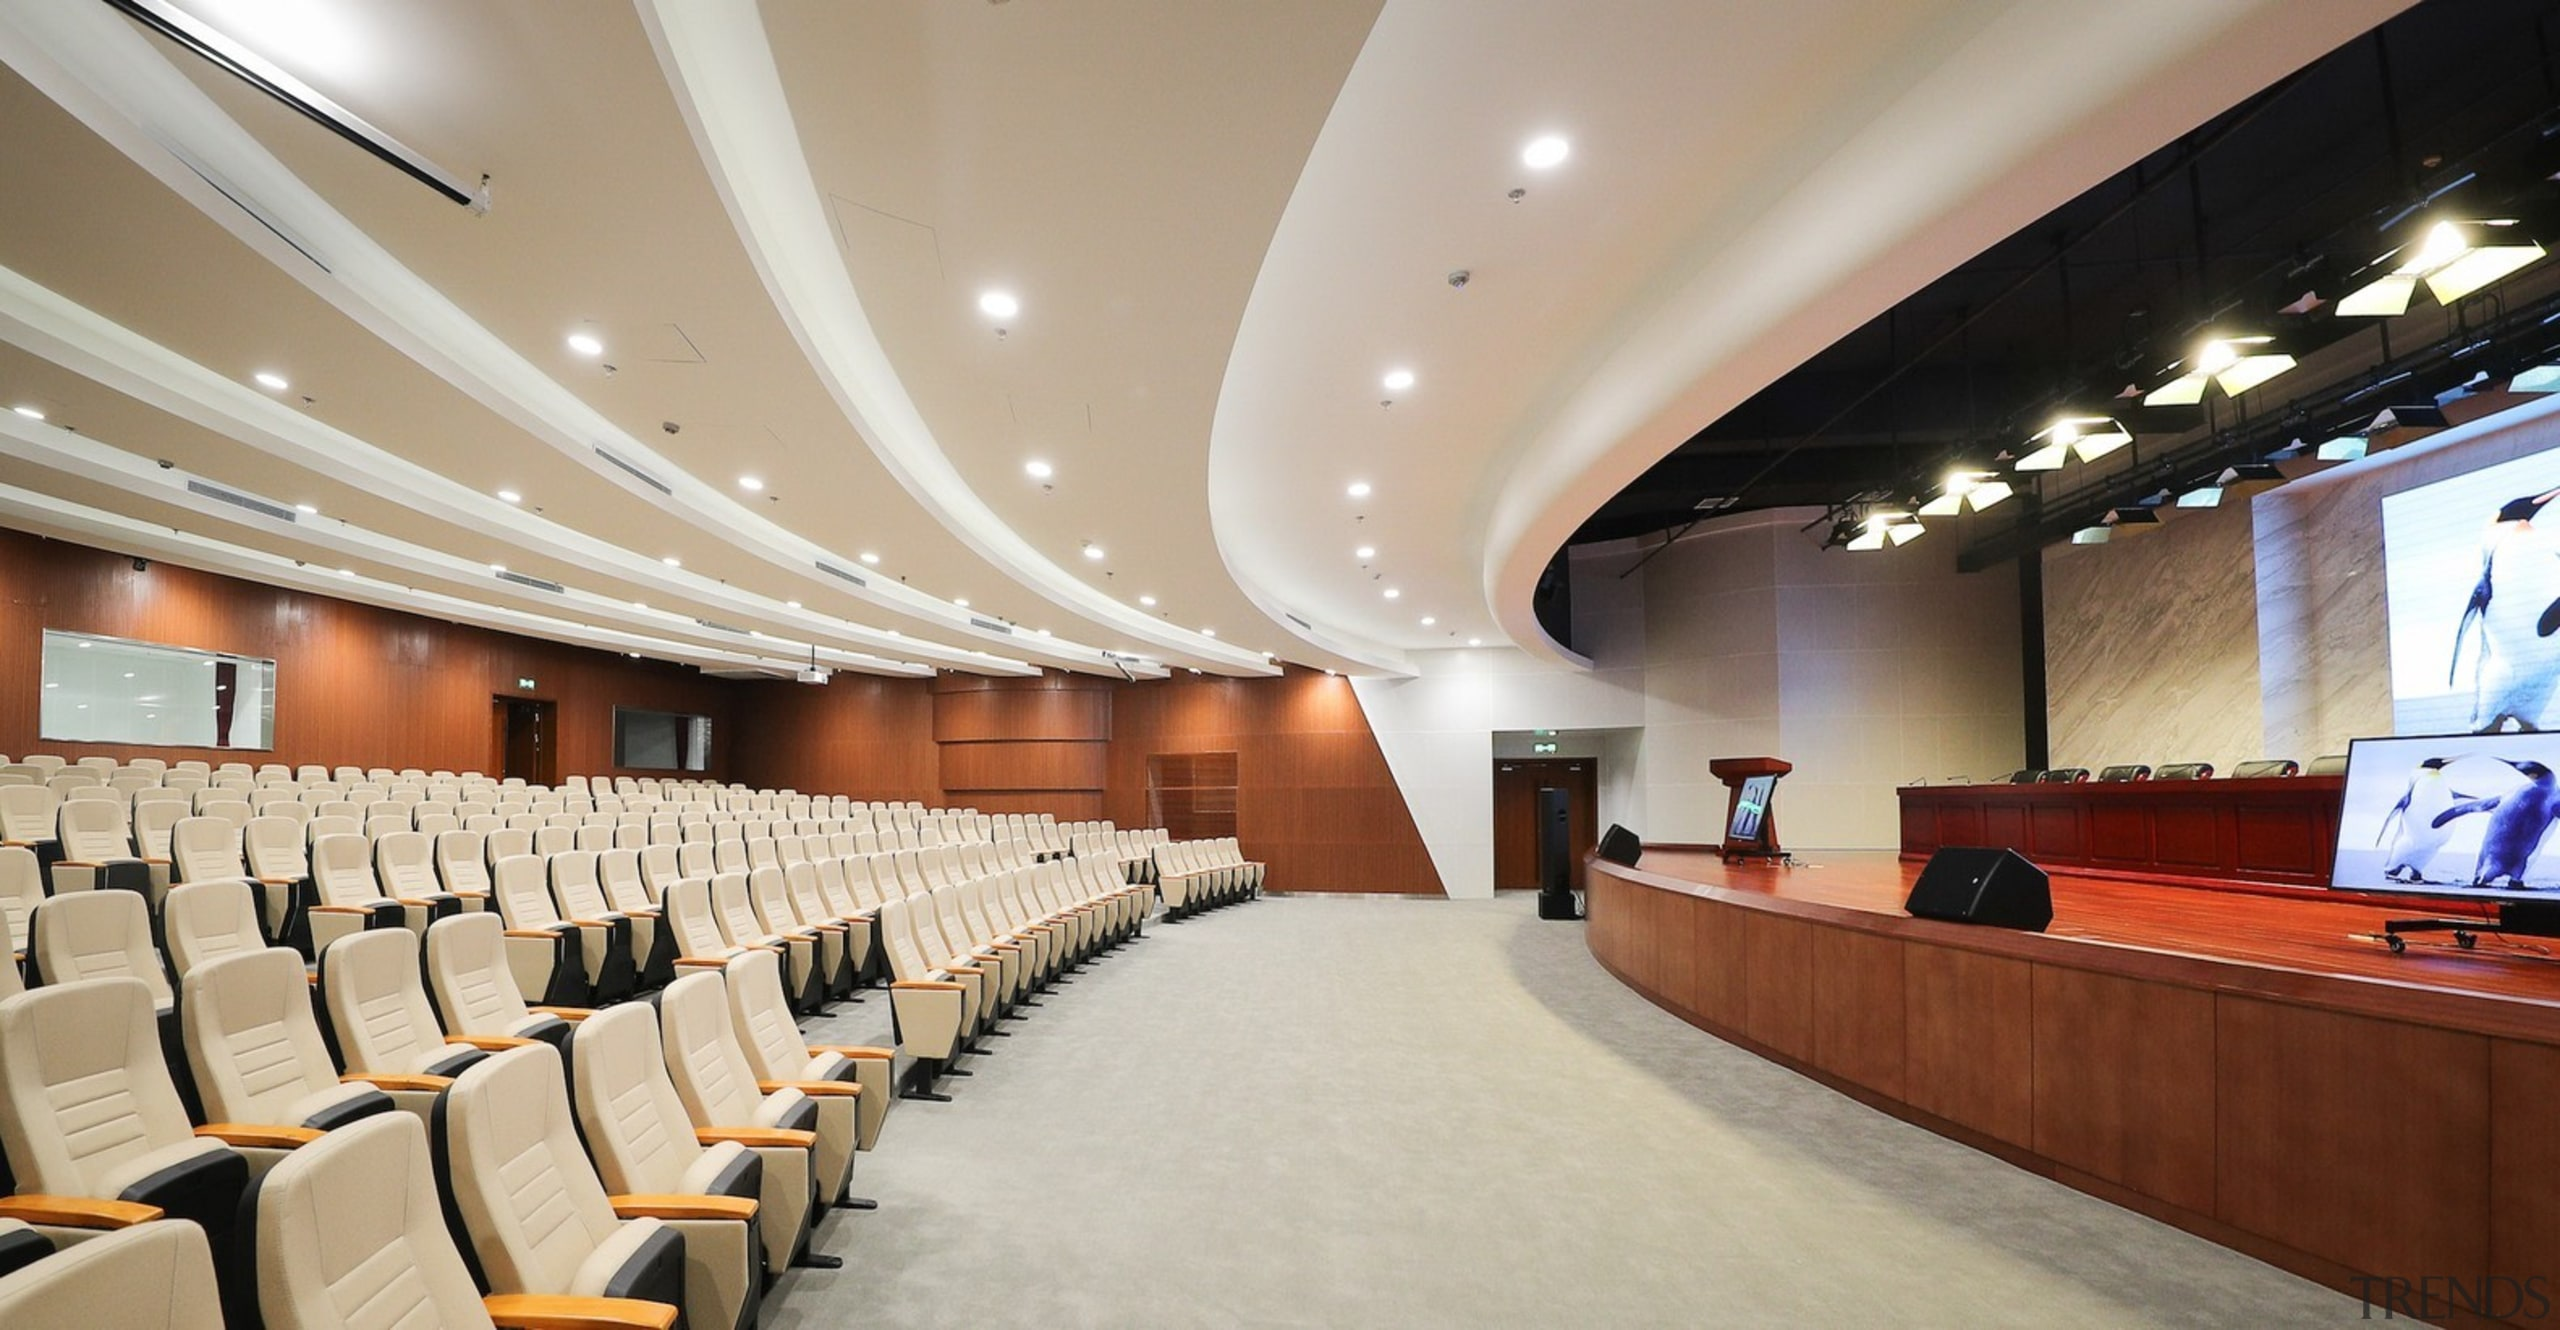 xxx - auditorium   ceiling   conference hall auditorium, ceiling, conference hall, convention center, function hall, interior design, performing arts center, gray